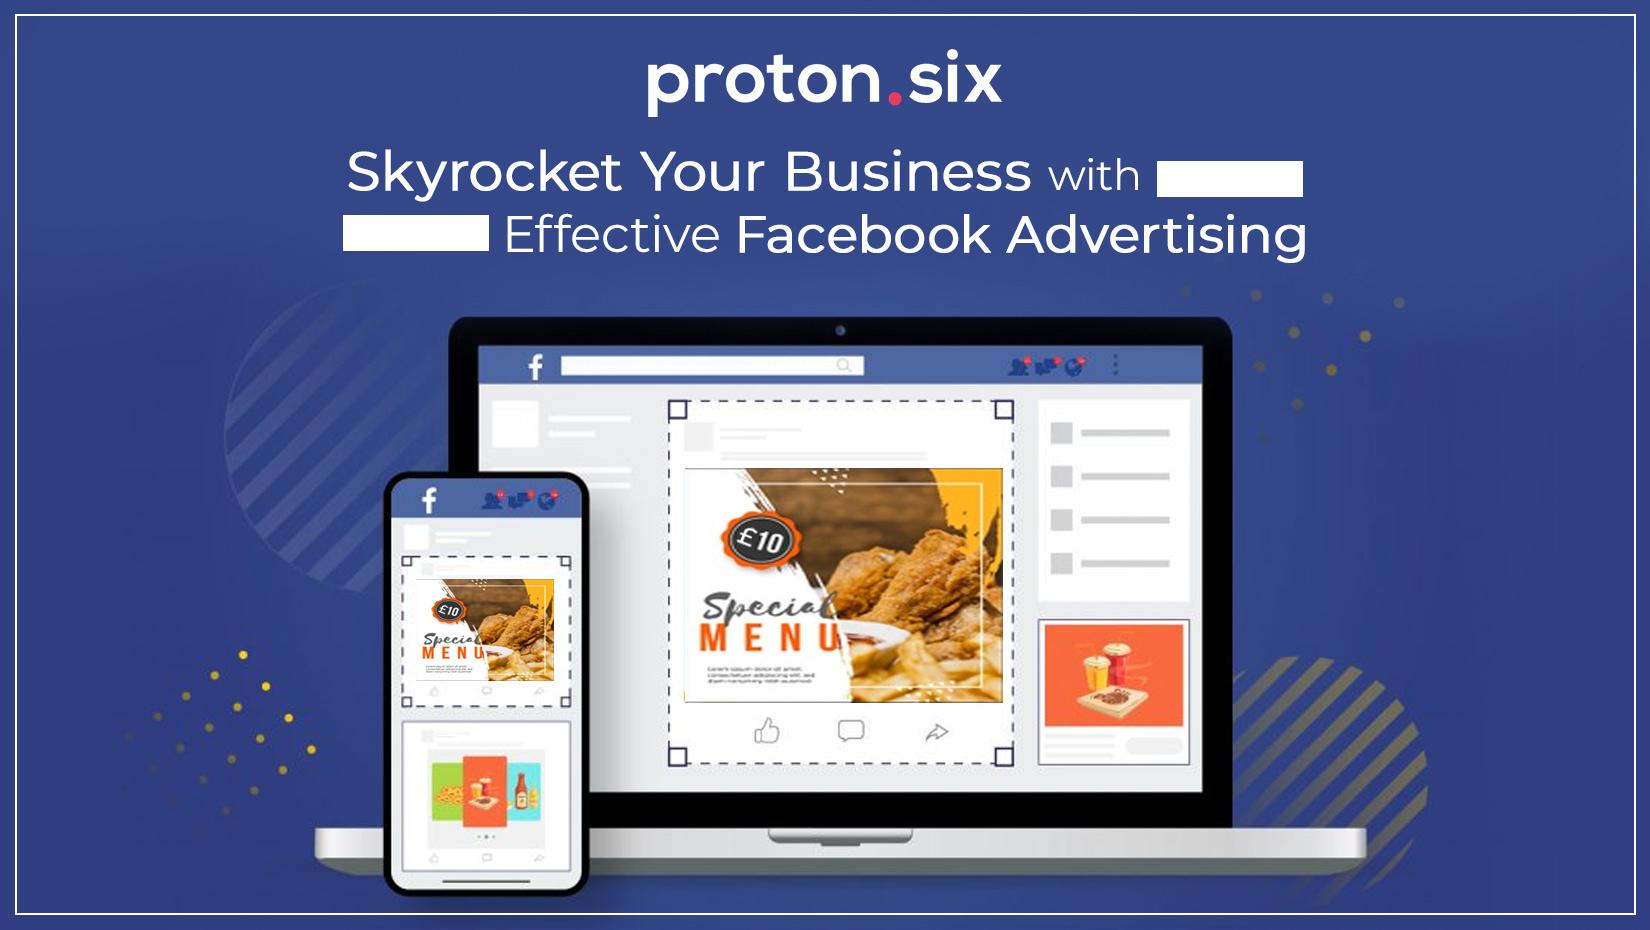 Effective FaceBook Advertising